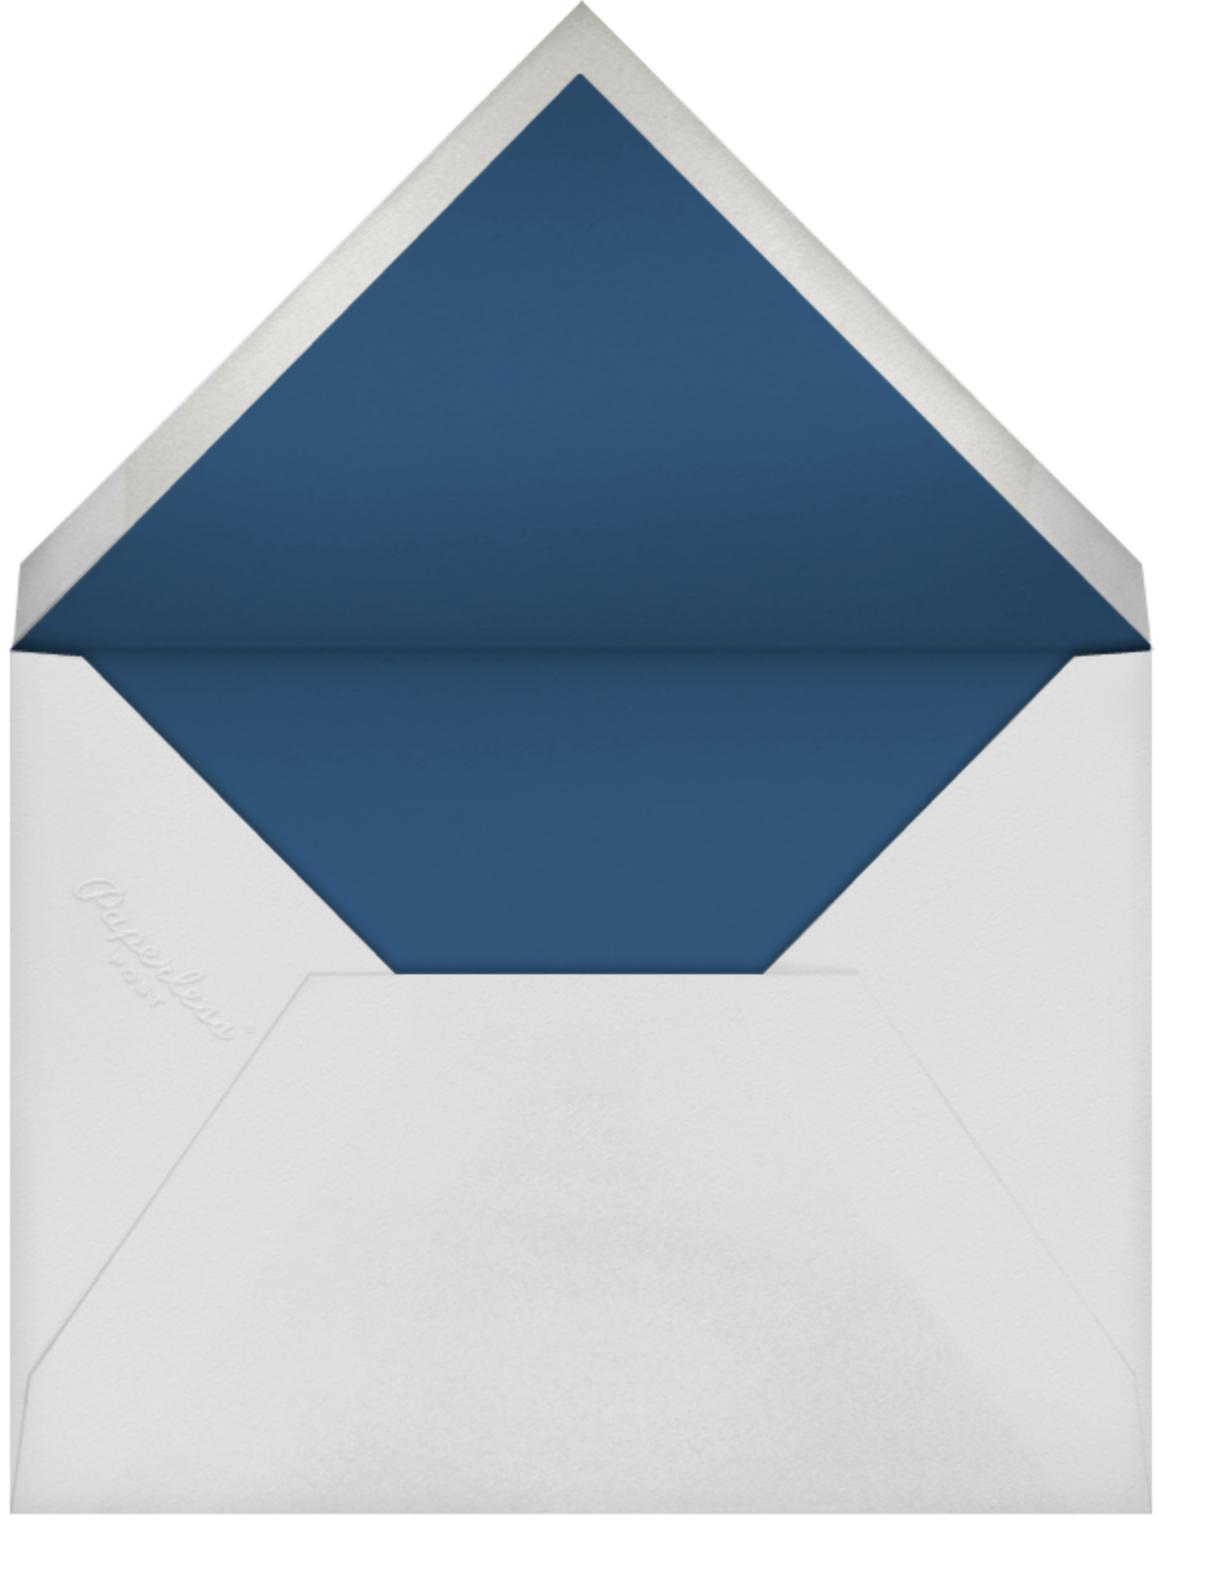 Gardenia - White/Silver - Oscar de la Renta - Engagement party - envelope back